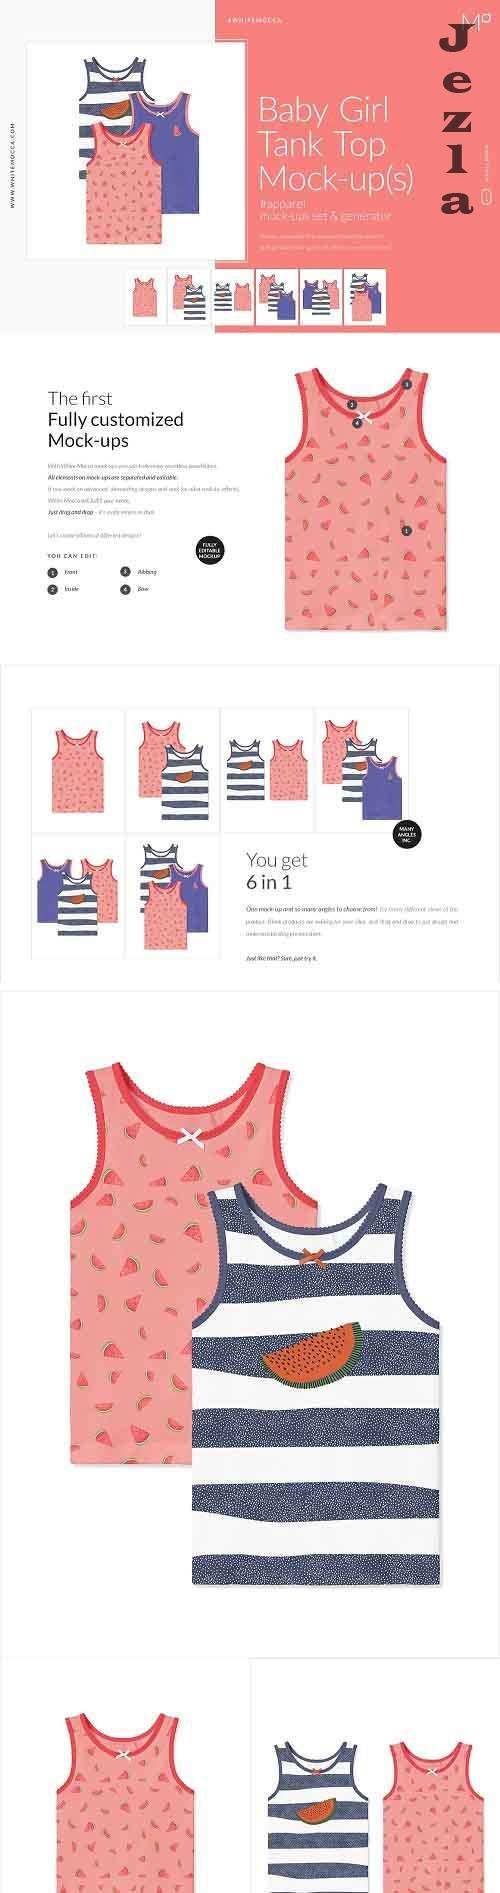 Baby Girl Tank Top Mock-ups Set 4662080